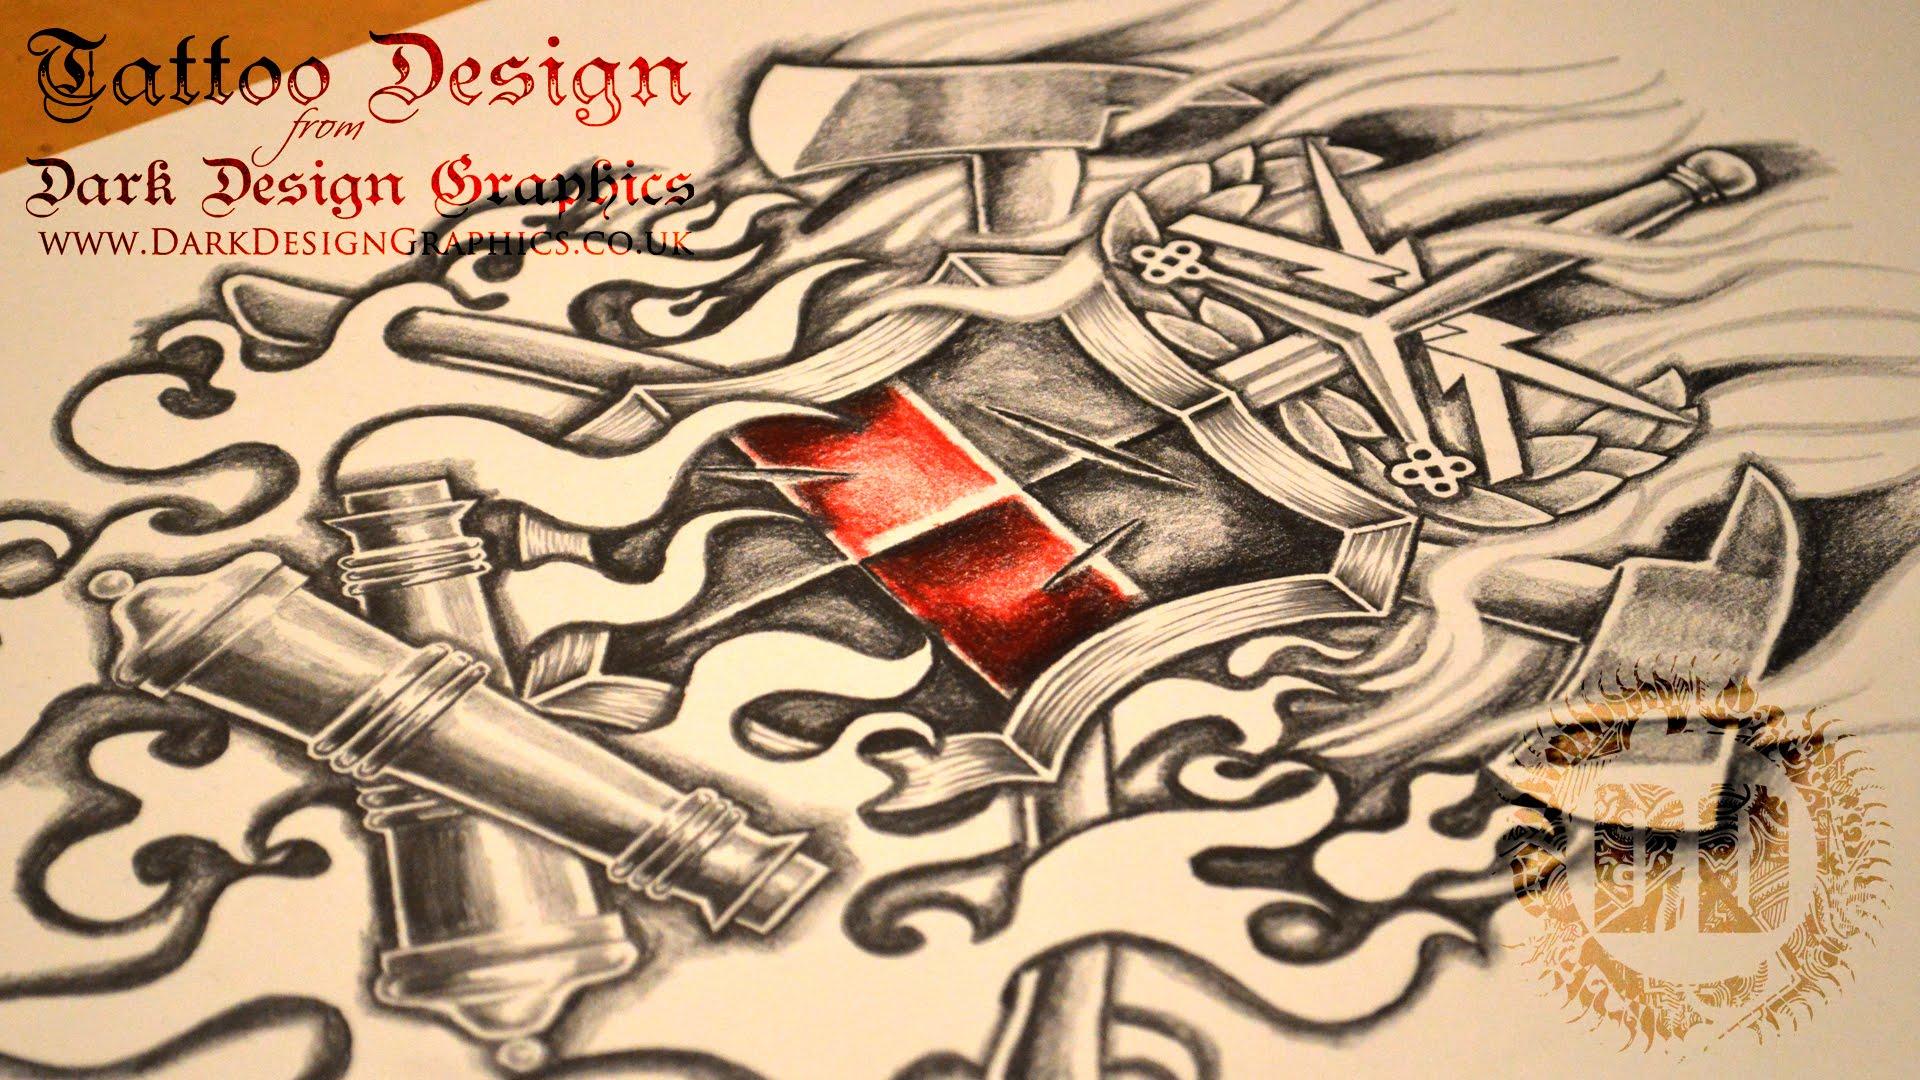 1920x1080 Warrior Coat Of Arms Tattoo Design